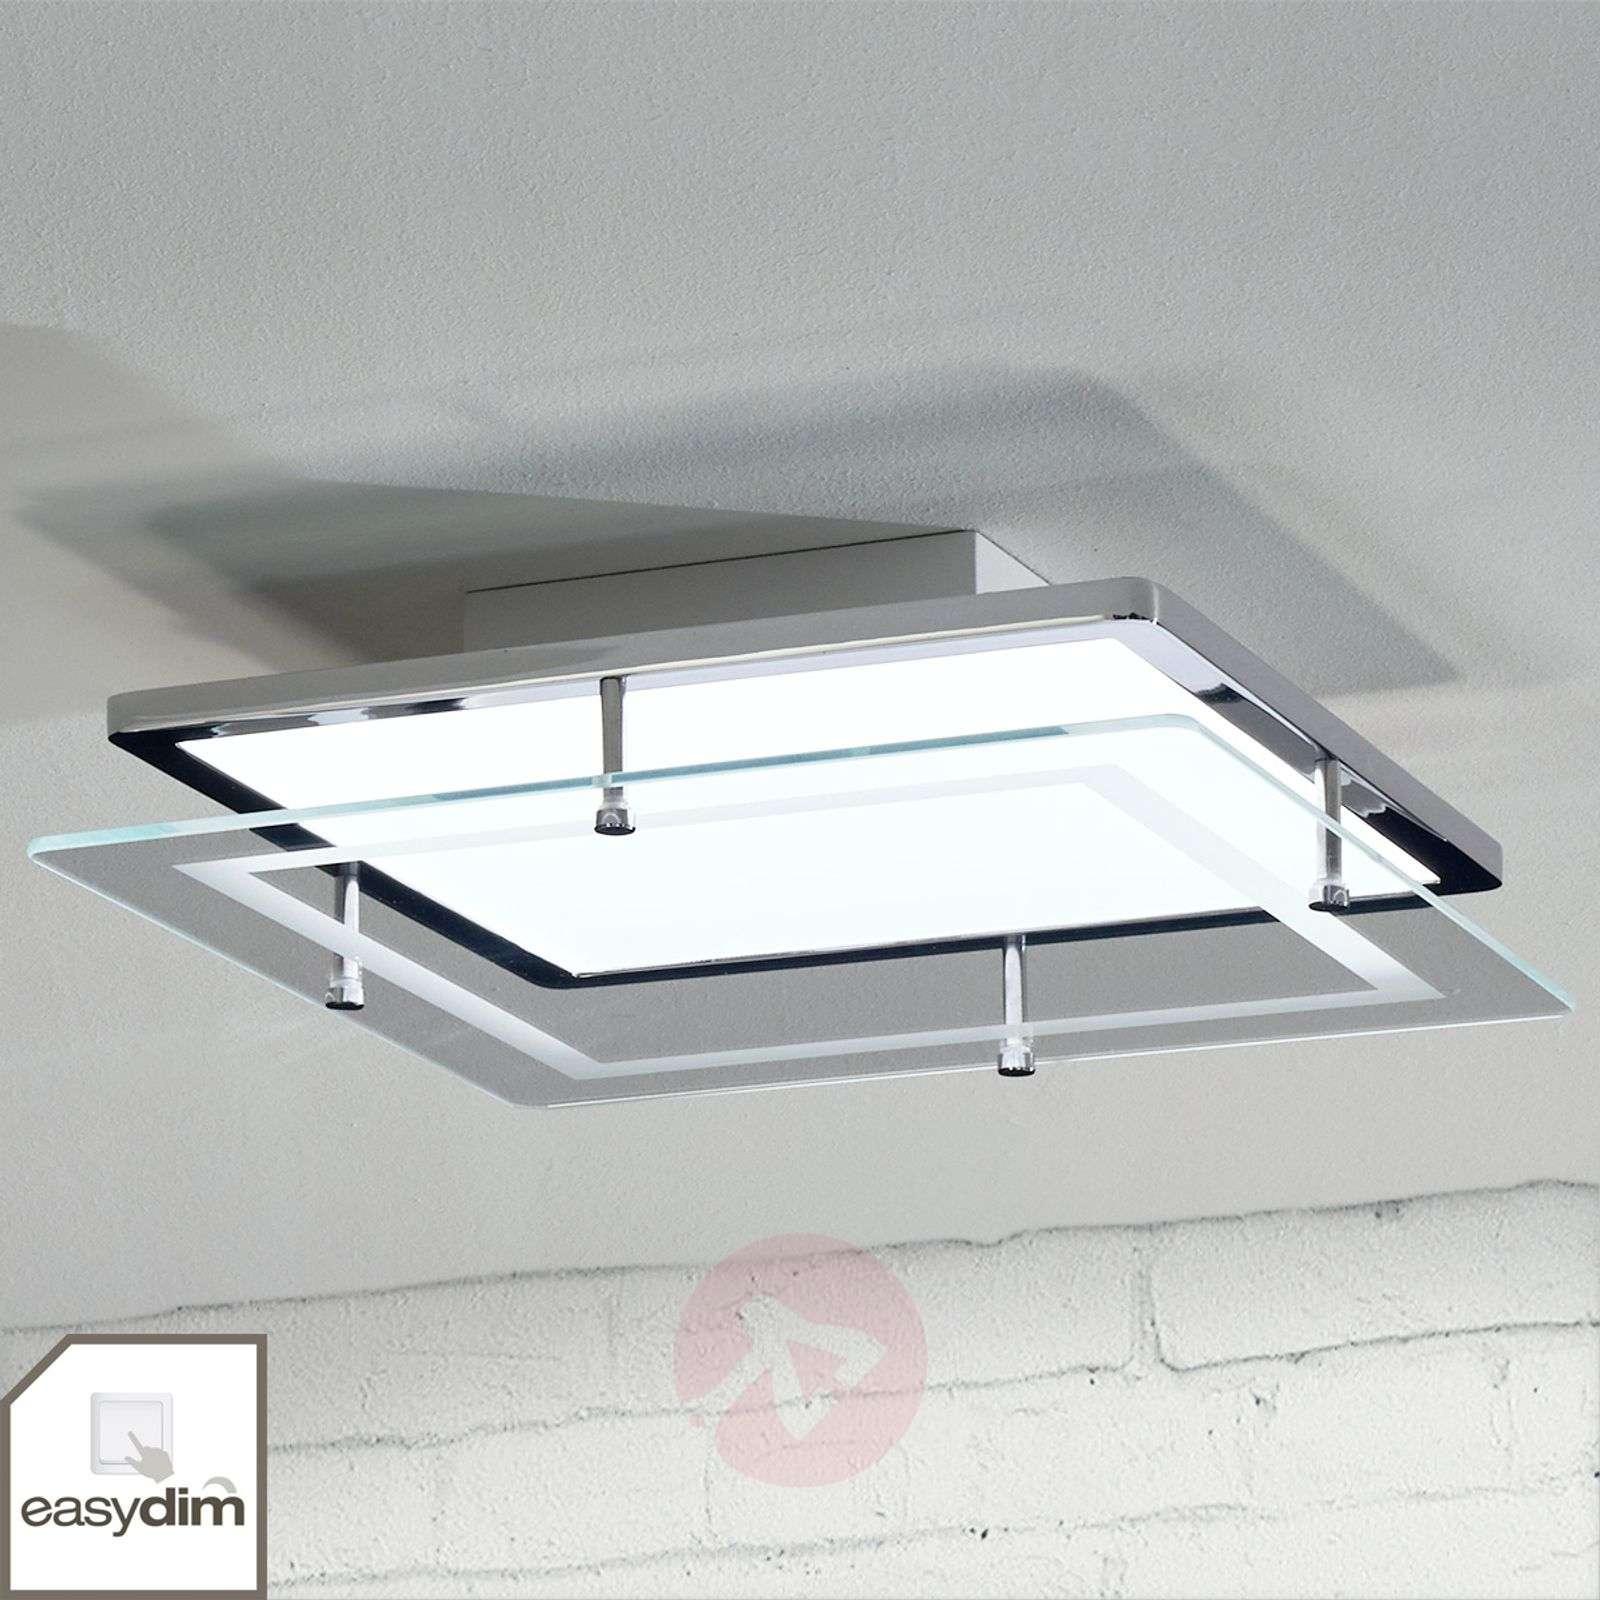 Sandra Easydim LED ceiling lamp with glass panel-1558151-09